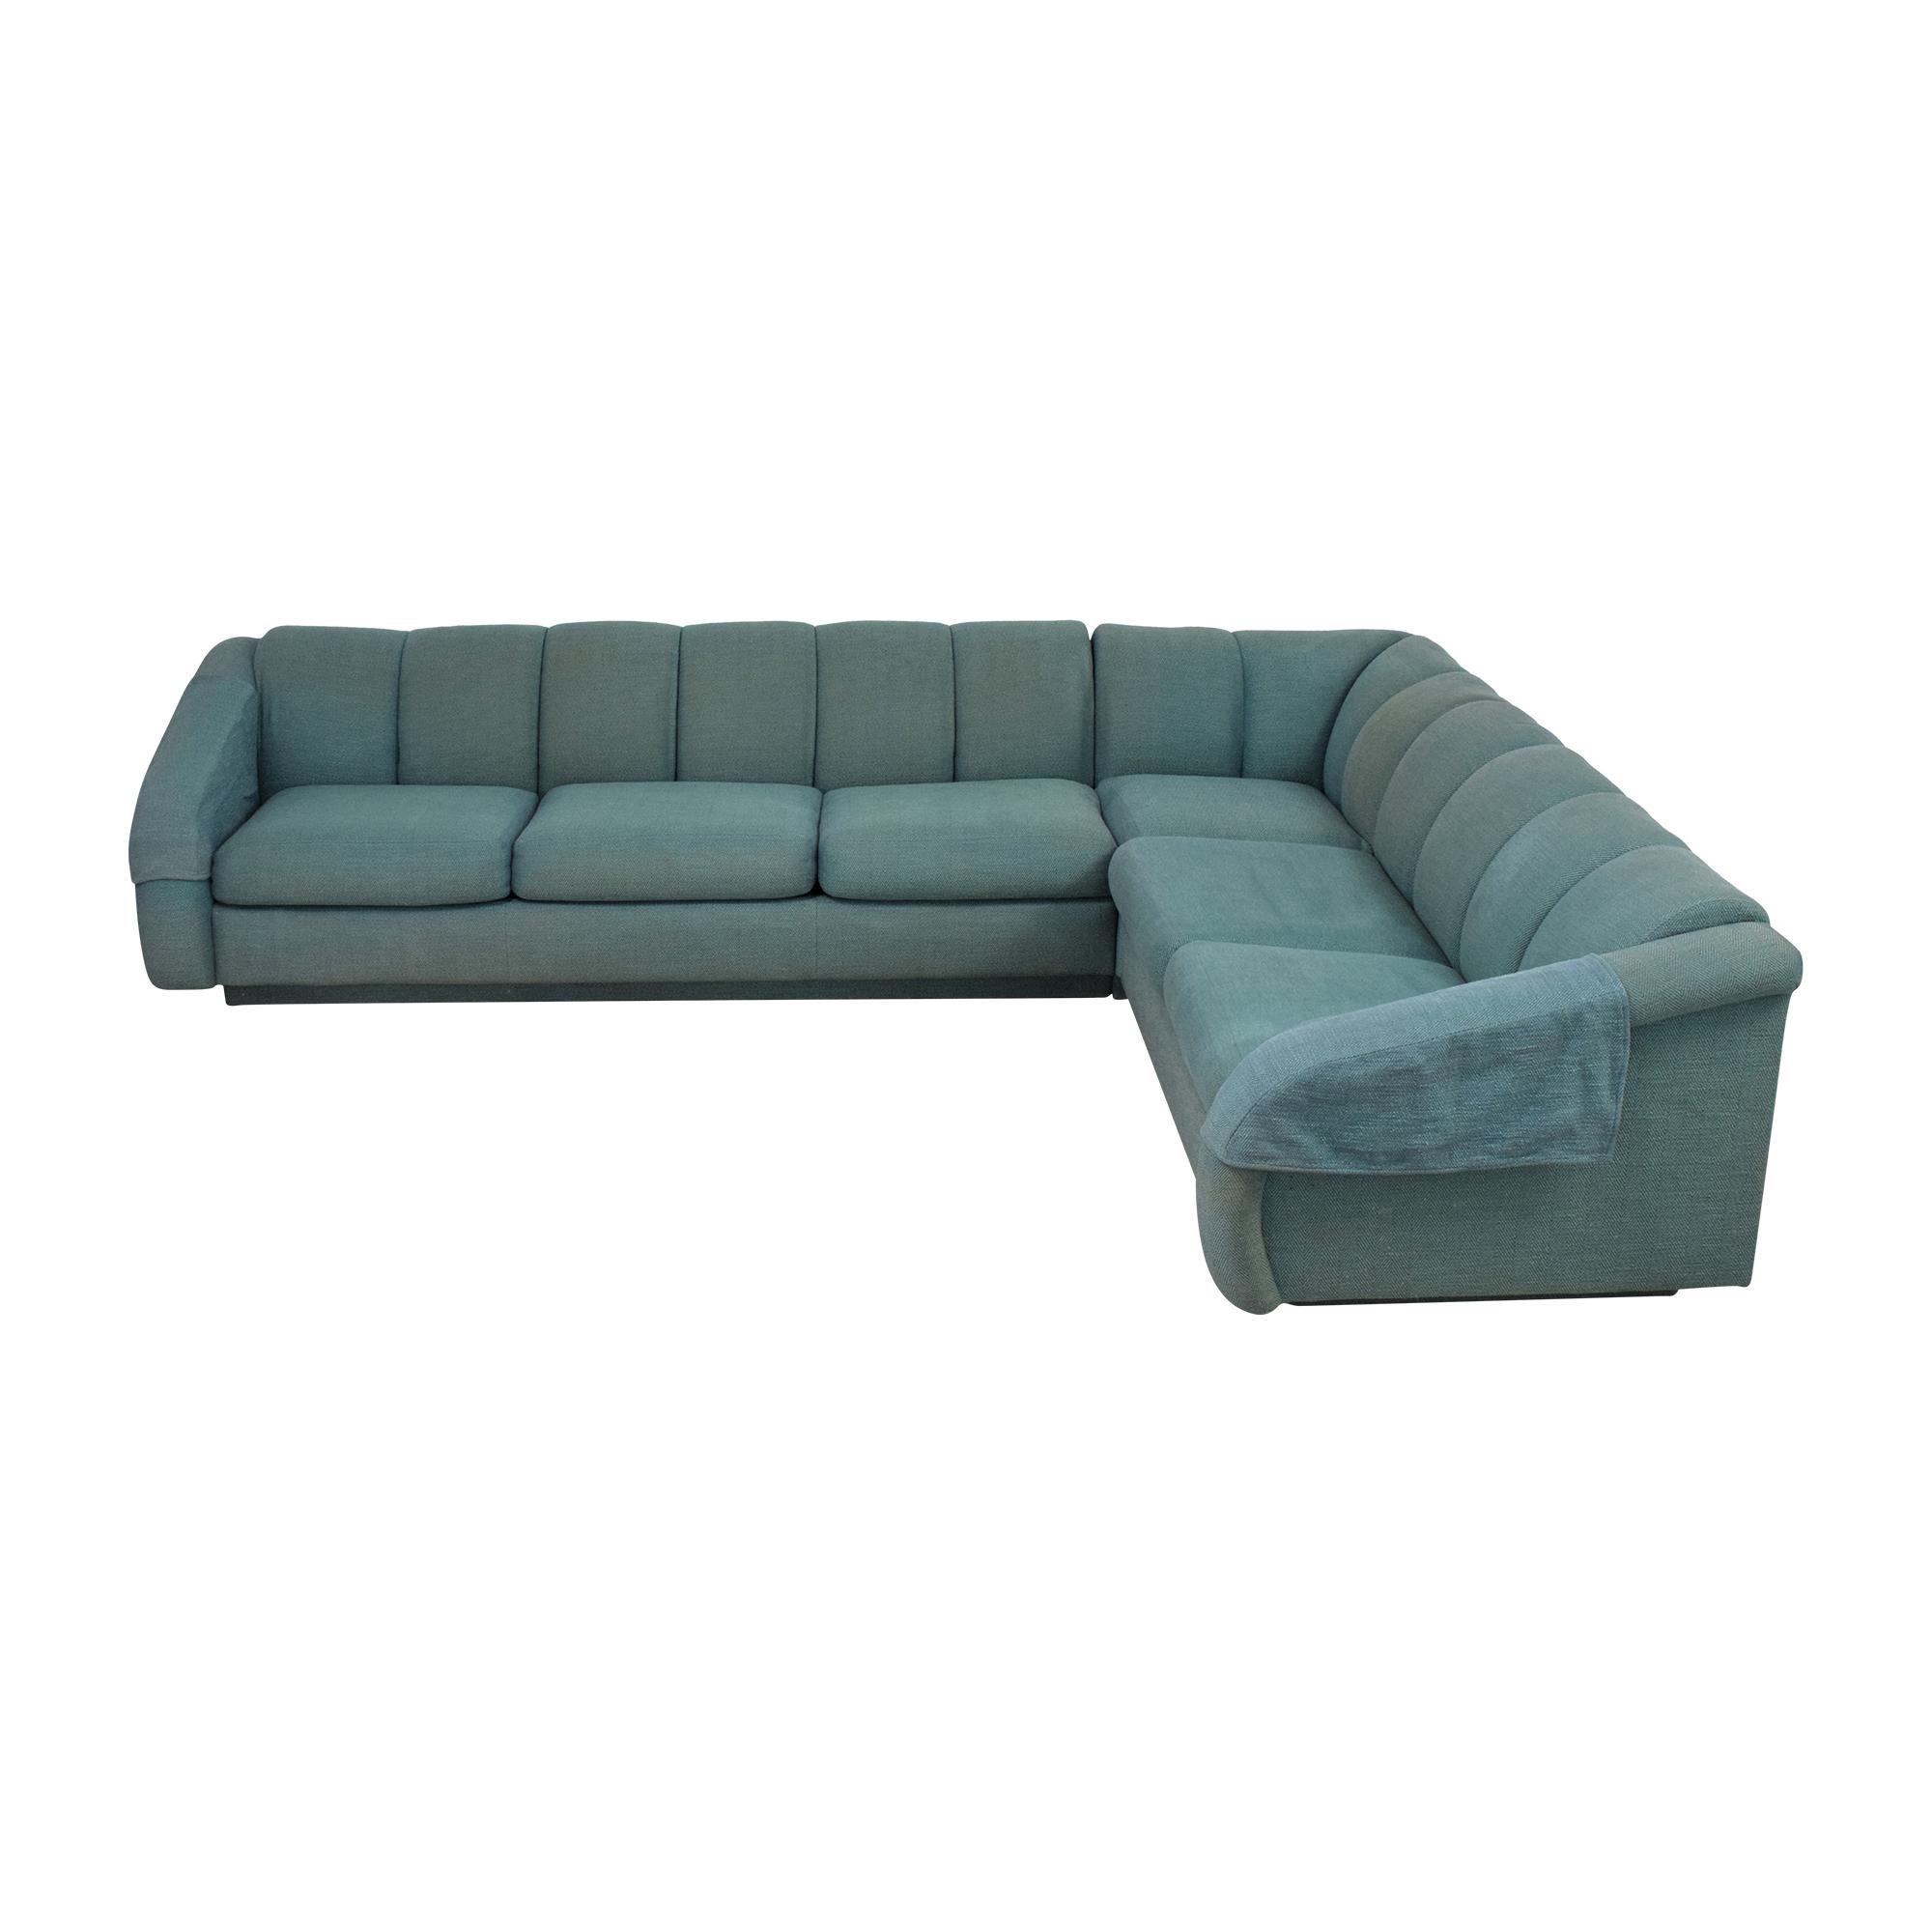 Directional Furniture Directional Furniture Sectional Sofa price